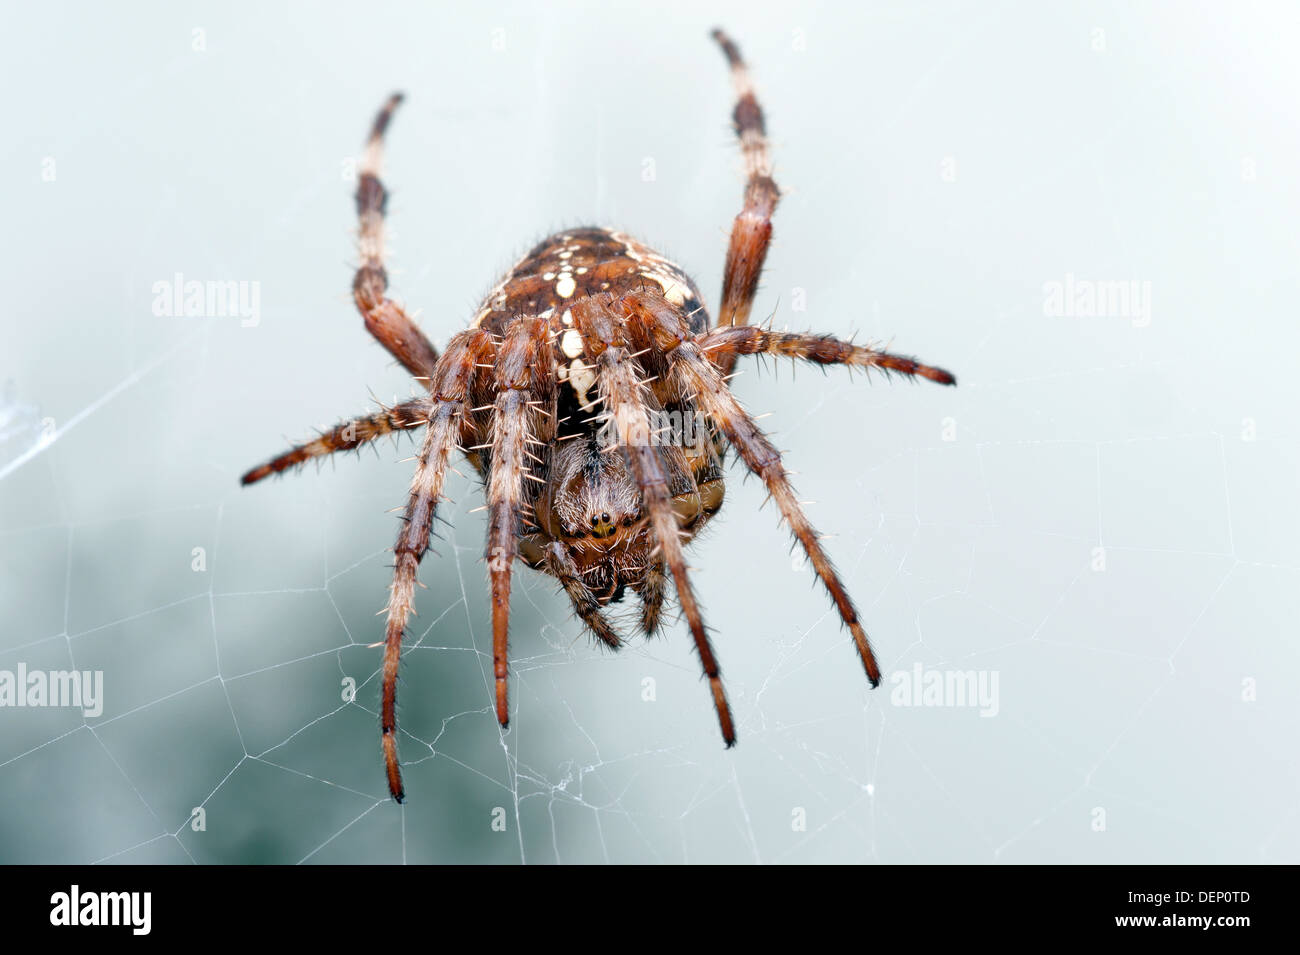 Spider - Araneus Diadematus, Orb weaver, garden spider in the net - Stock Image